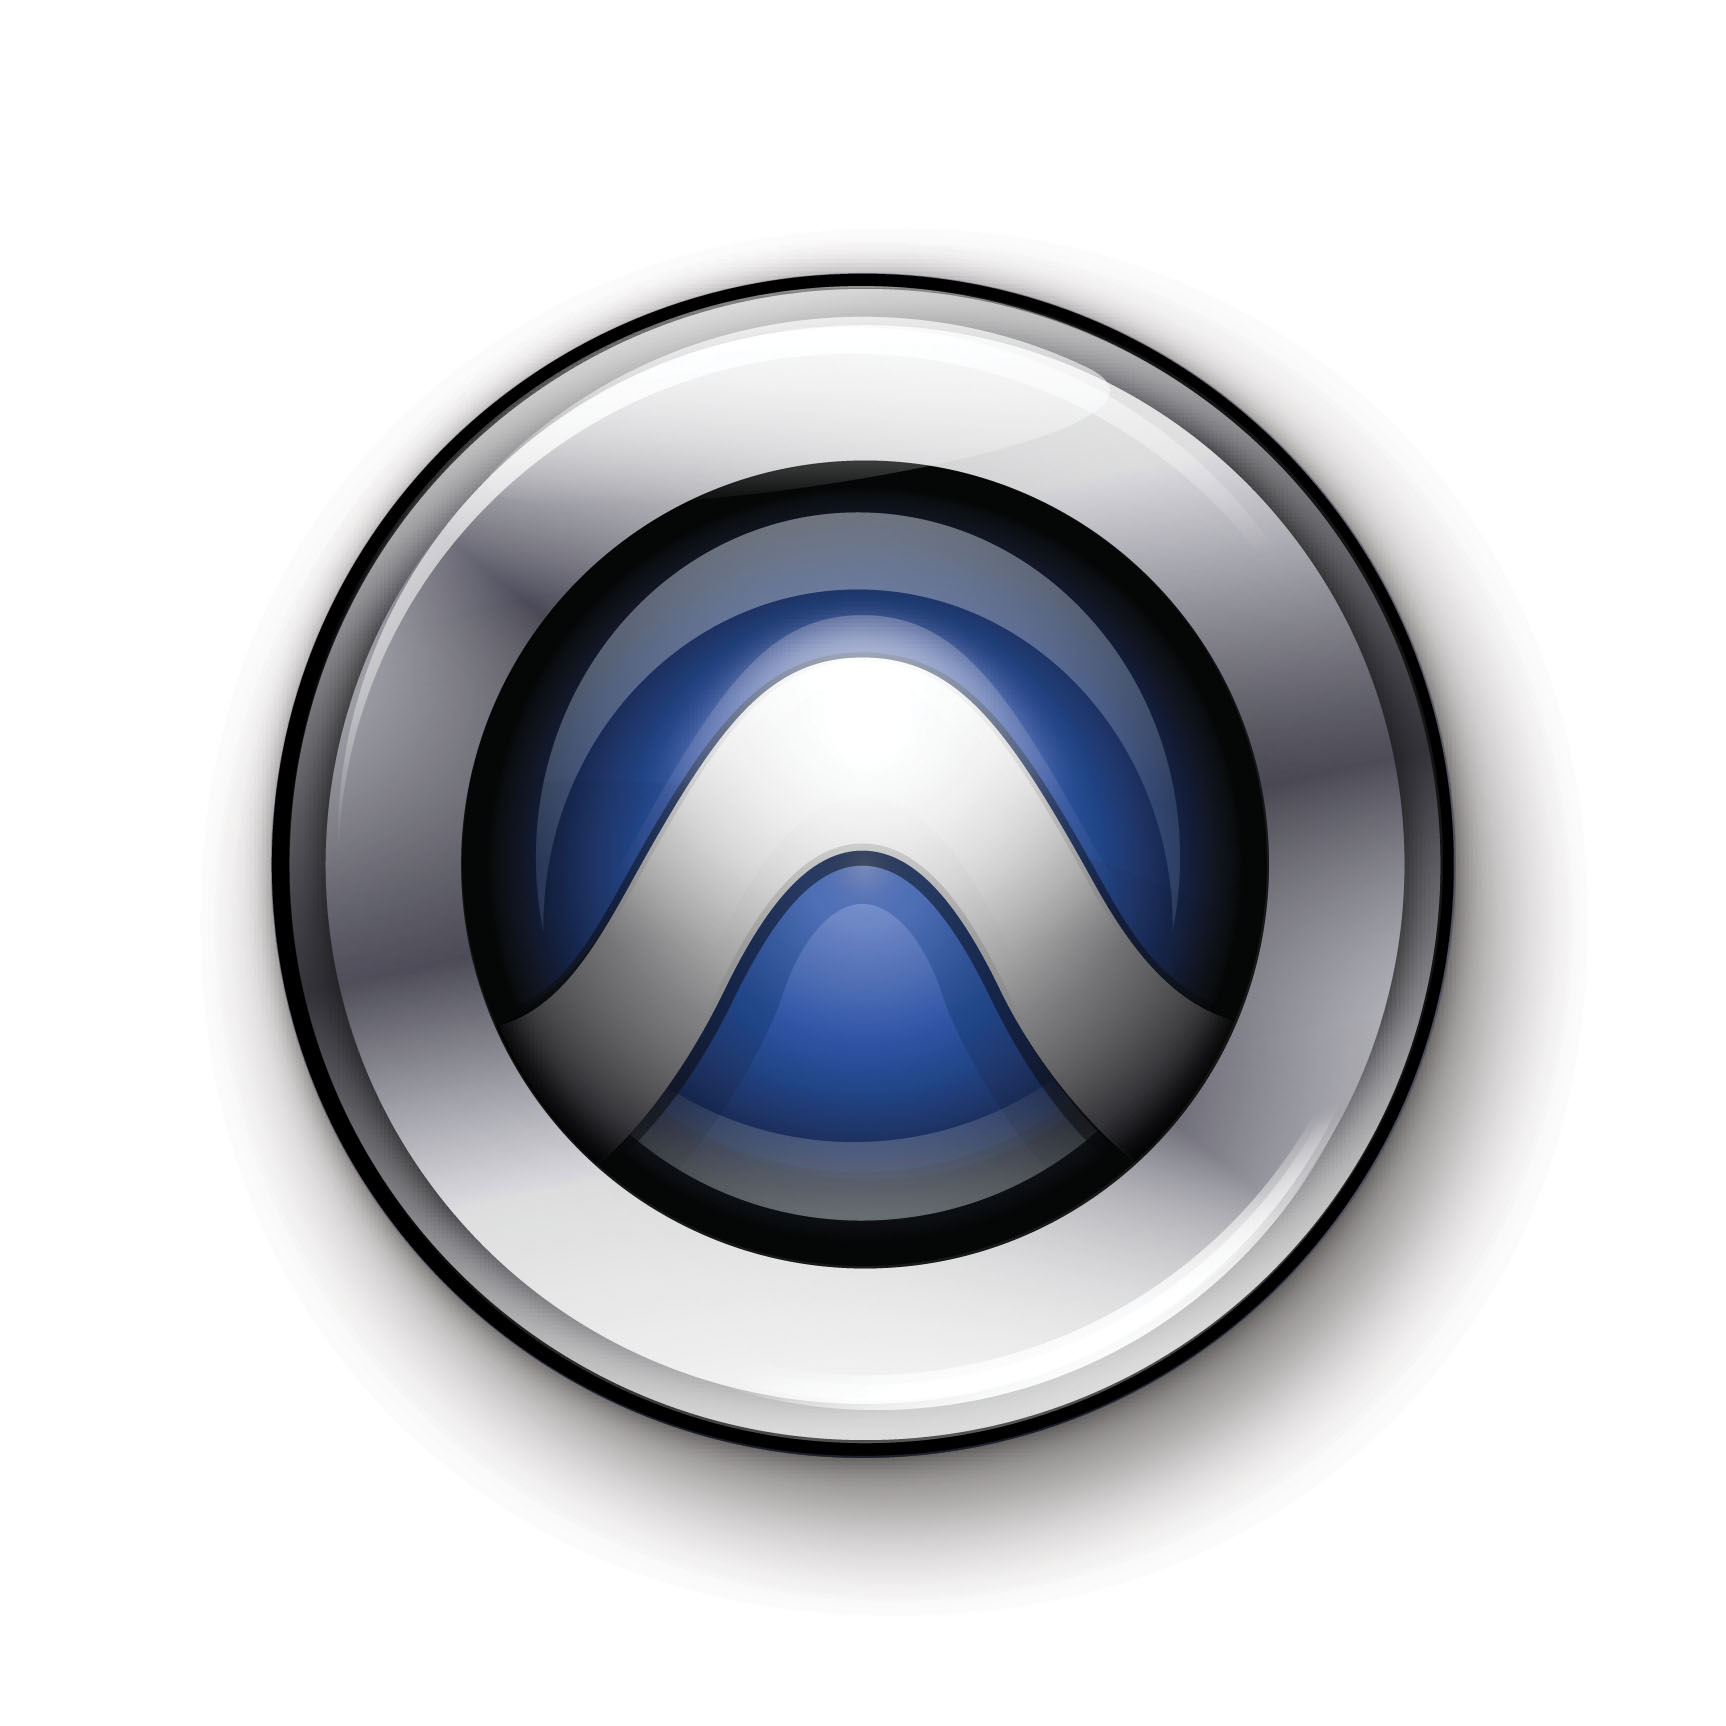 Protools logo